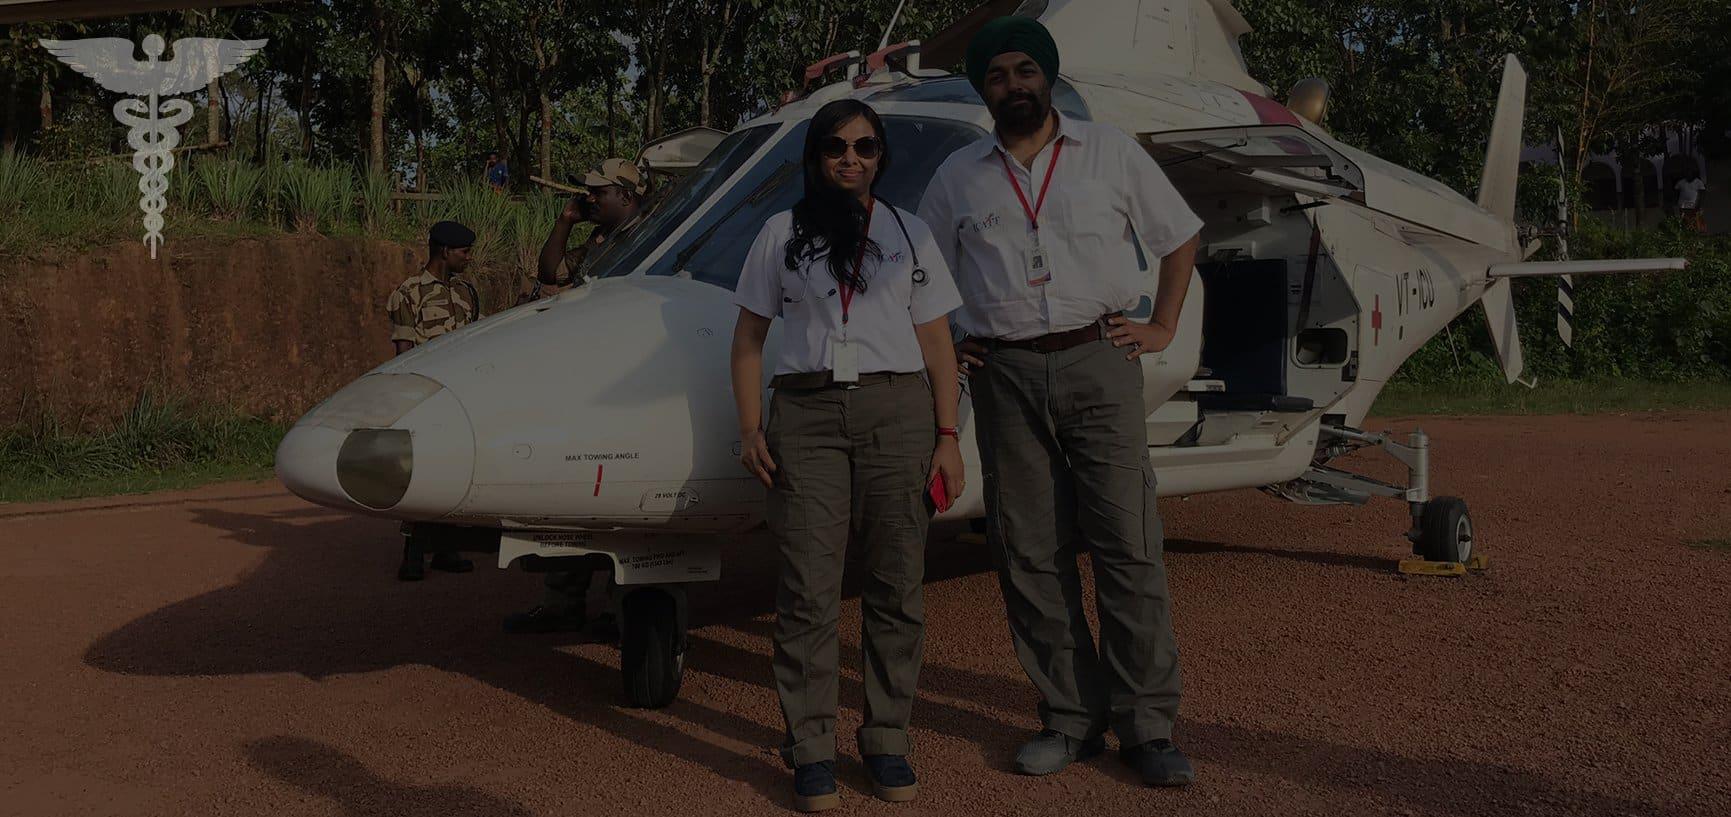 Air Ambulance in Bangalore